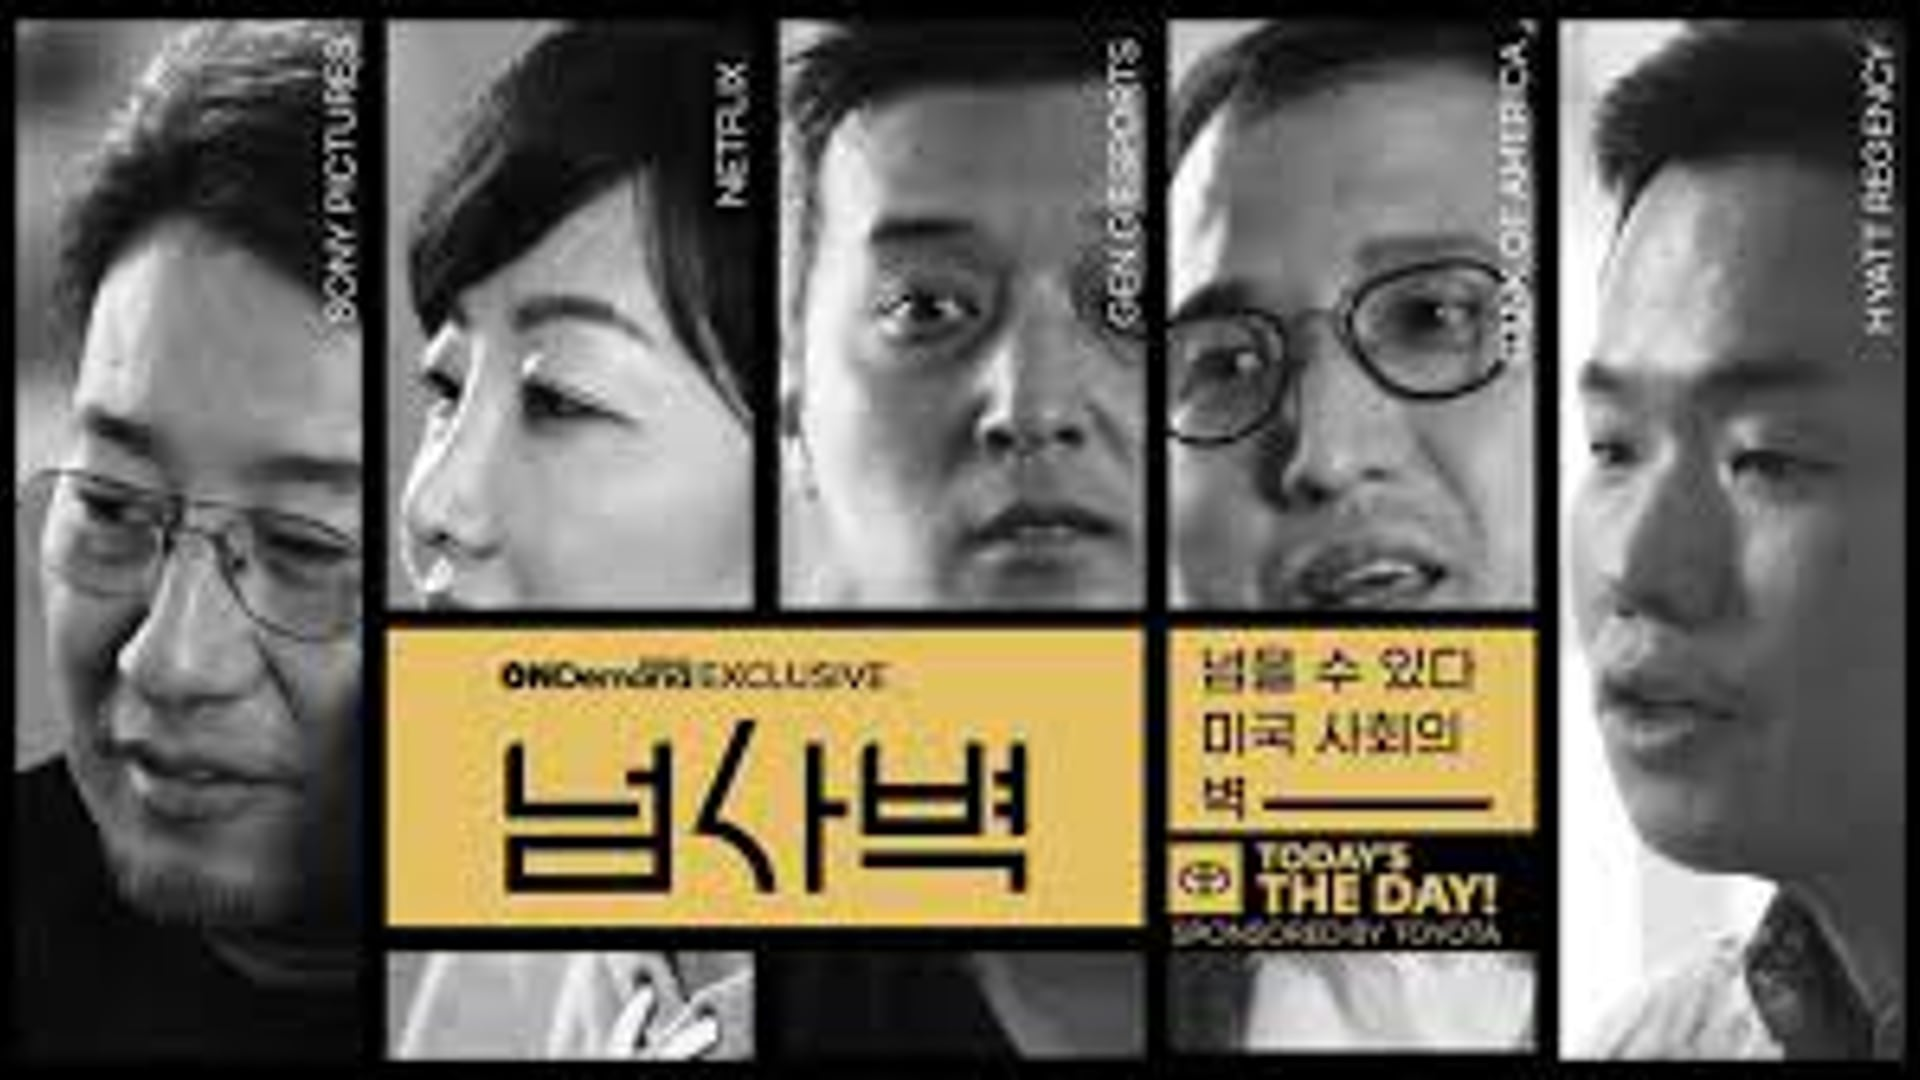 ODK_넘사벽_아카데미 감독상 전용덕 감독님 편_'쿵푸팬더','슈렉 포에버'_Dejong Film, LLC